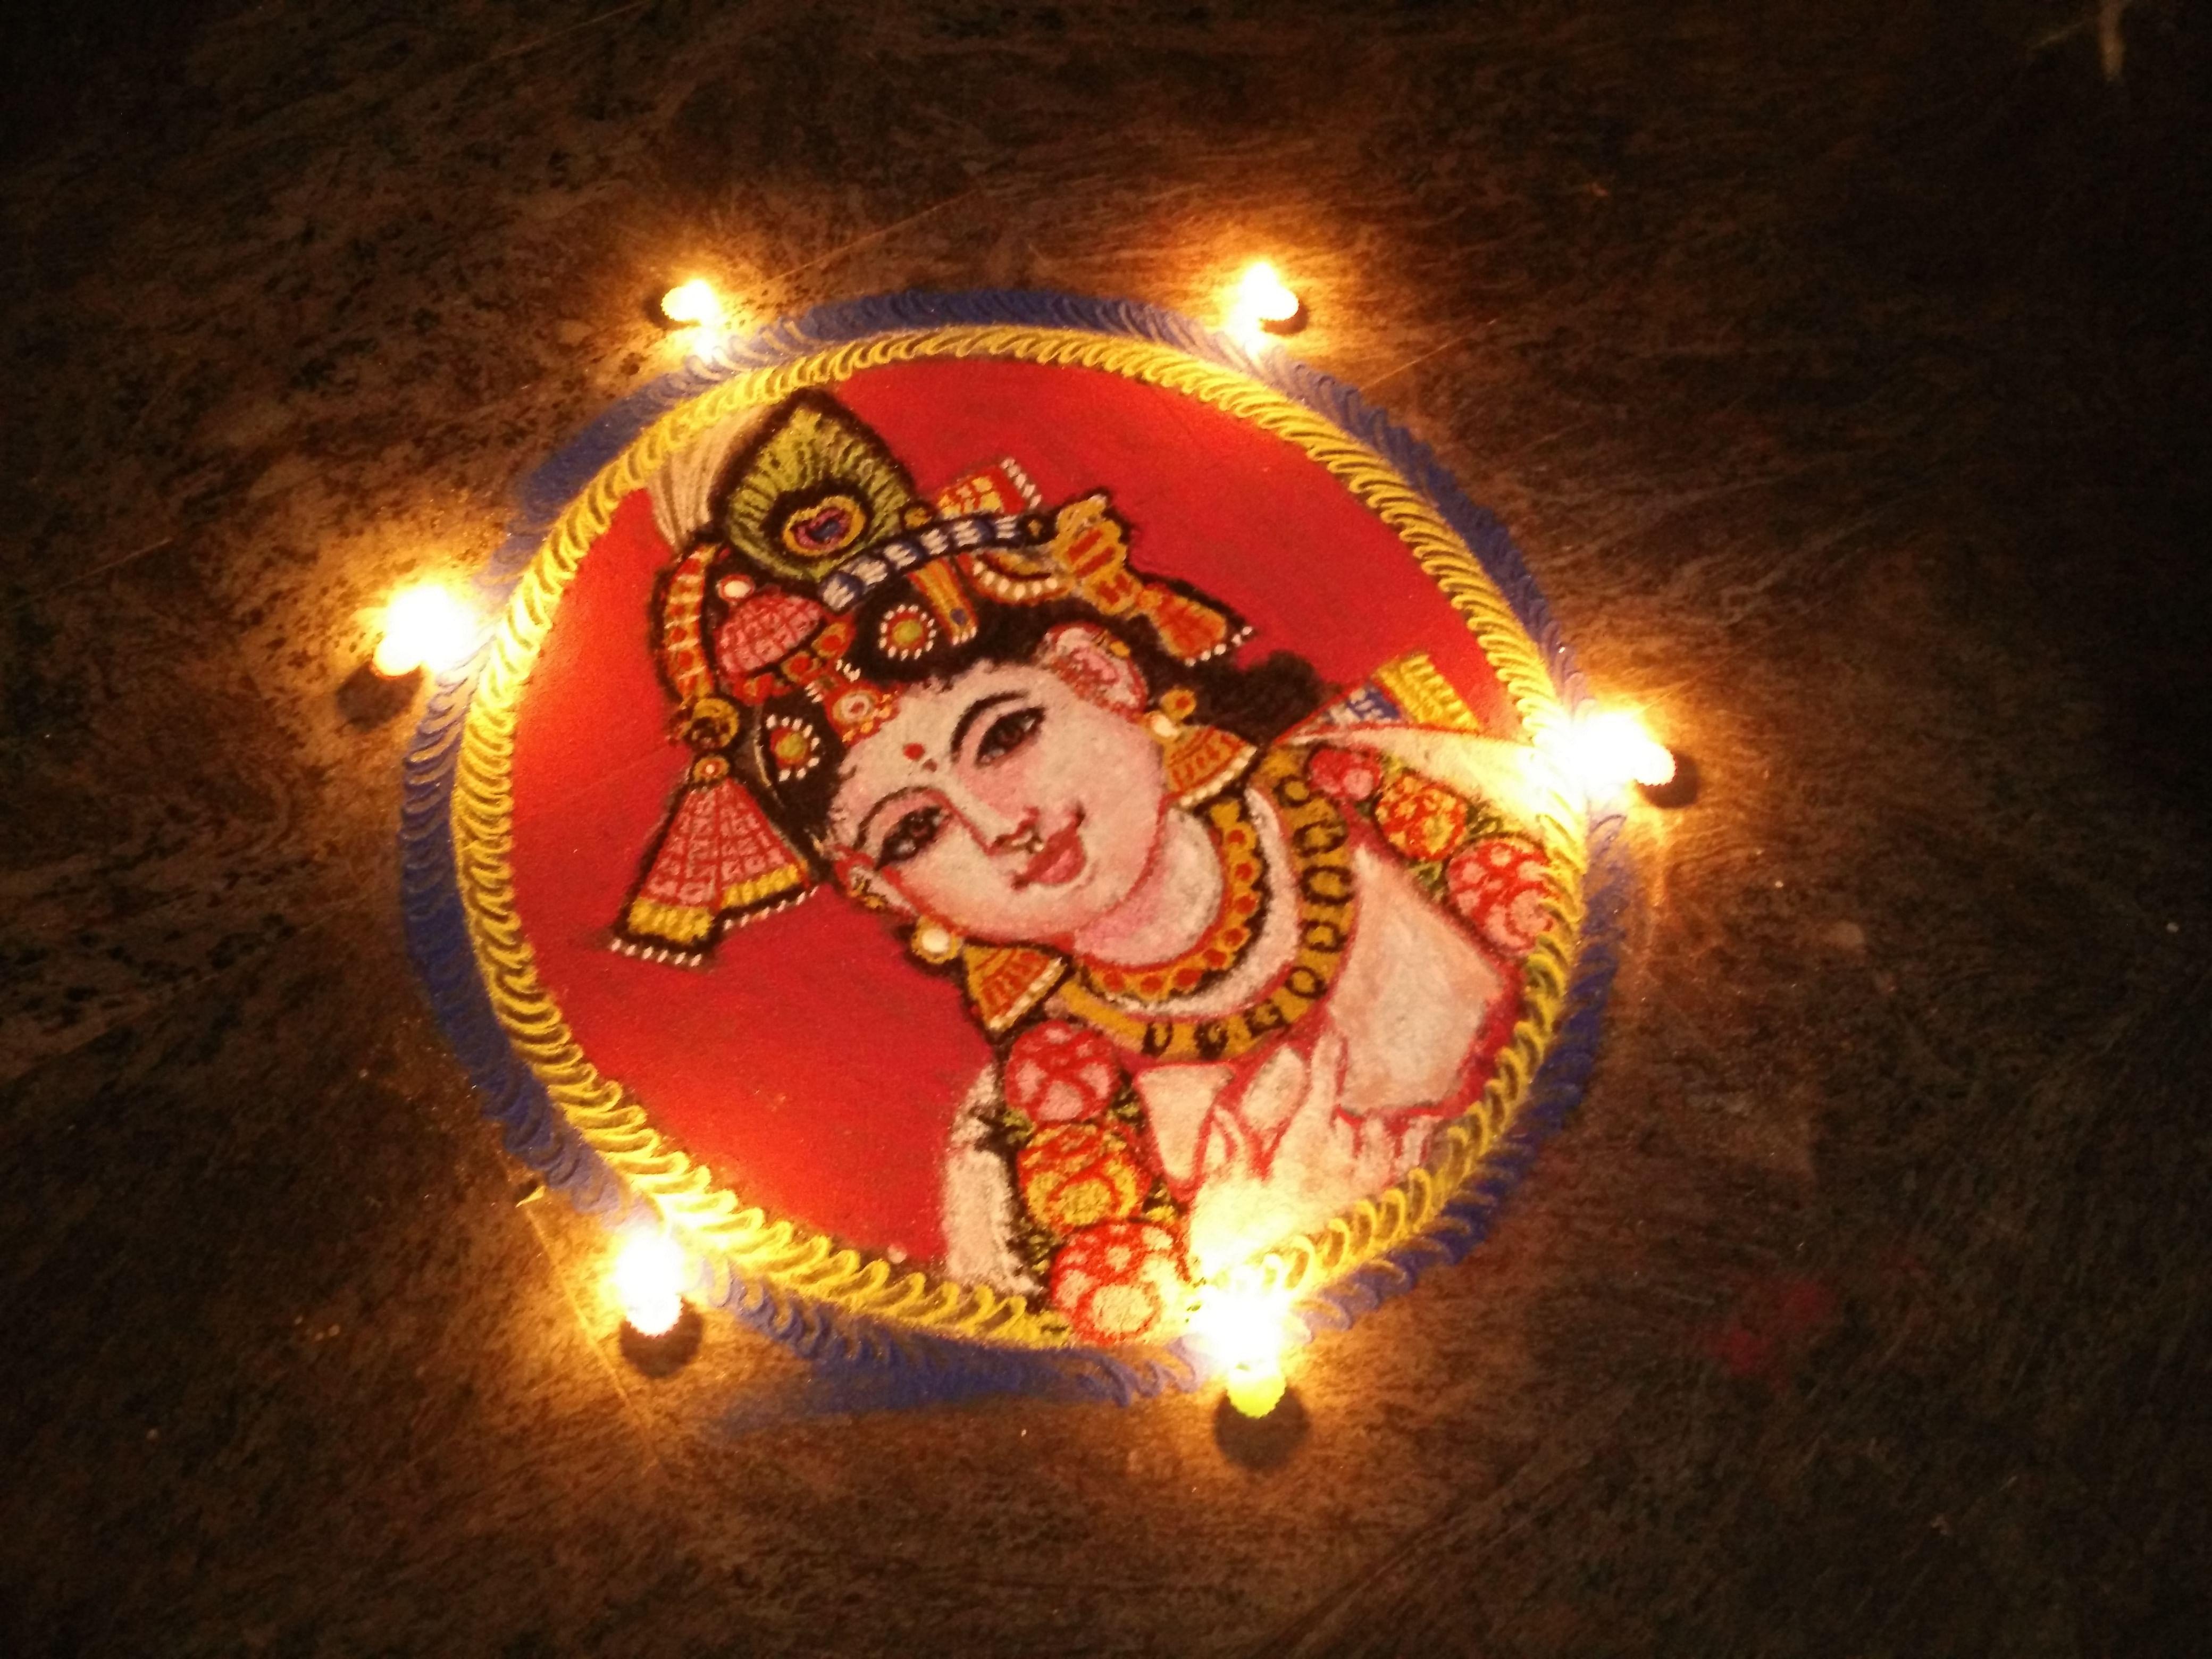 Art work by Mangalam Srinivasan